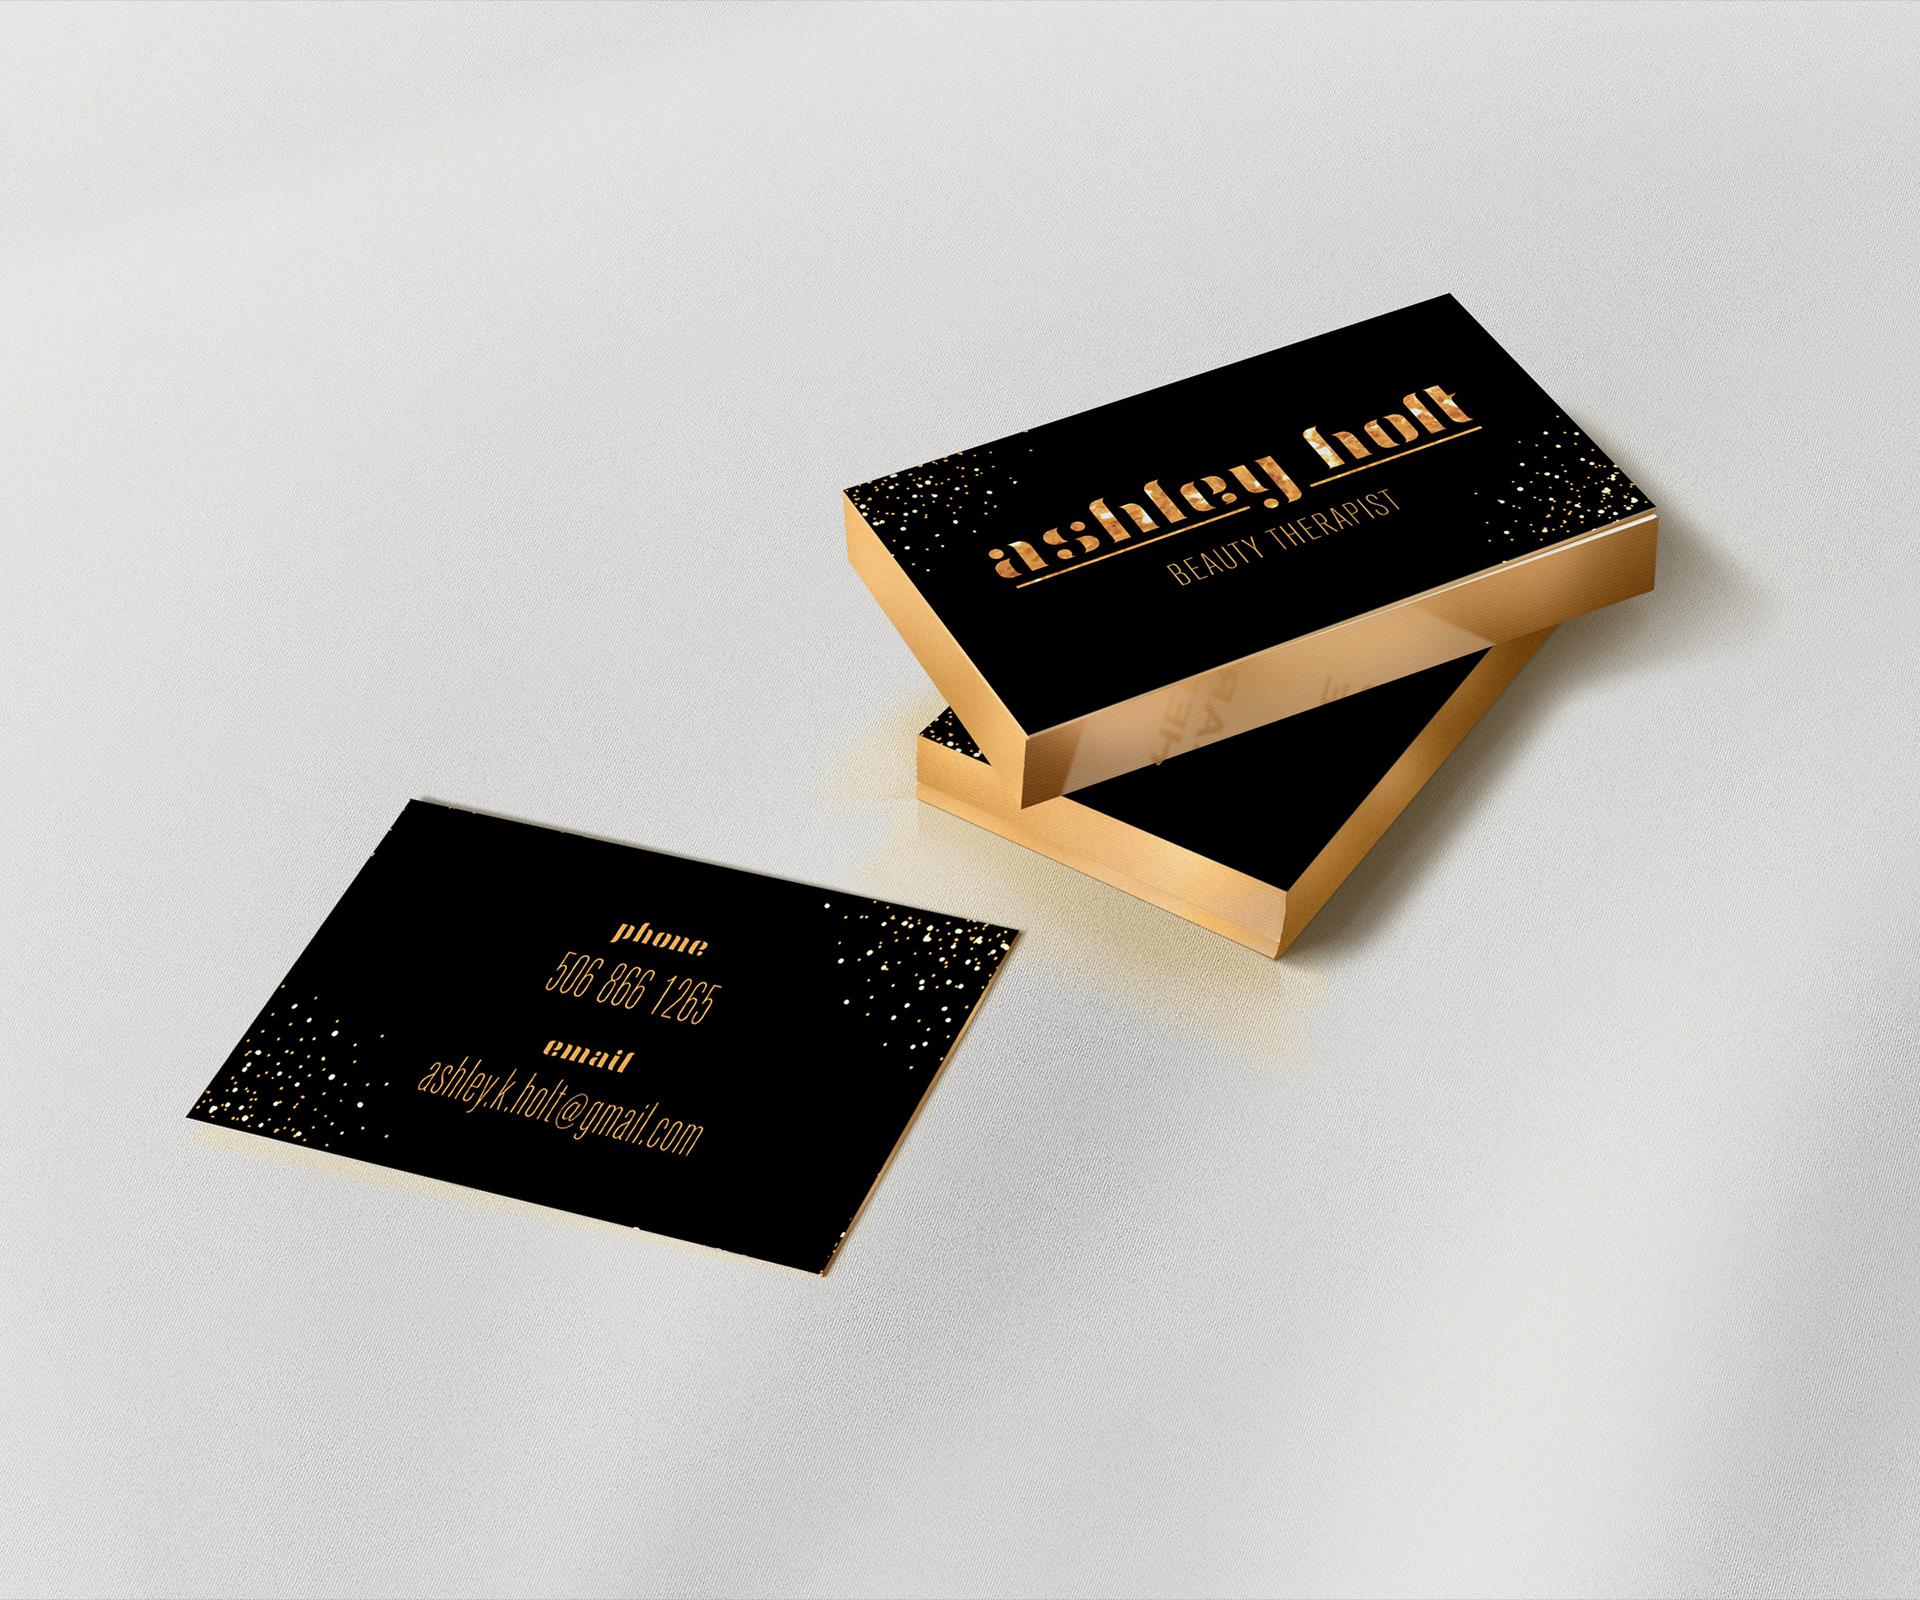 Meghan thebeau tri fold business card design tri fold business card design colourmoves